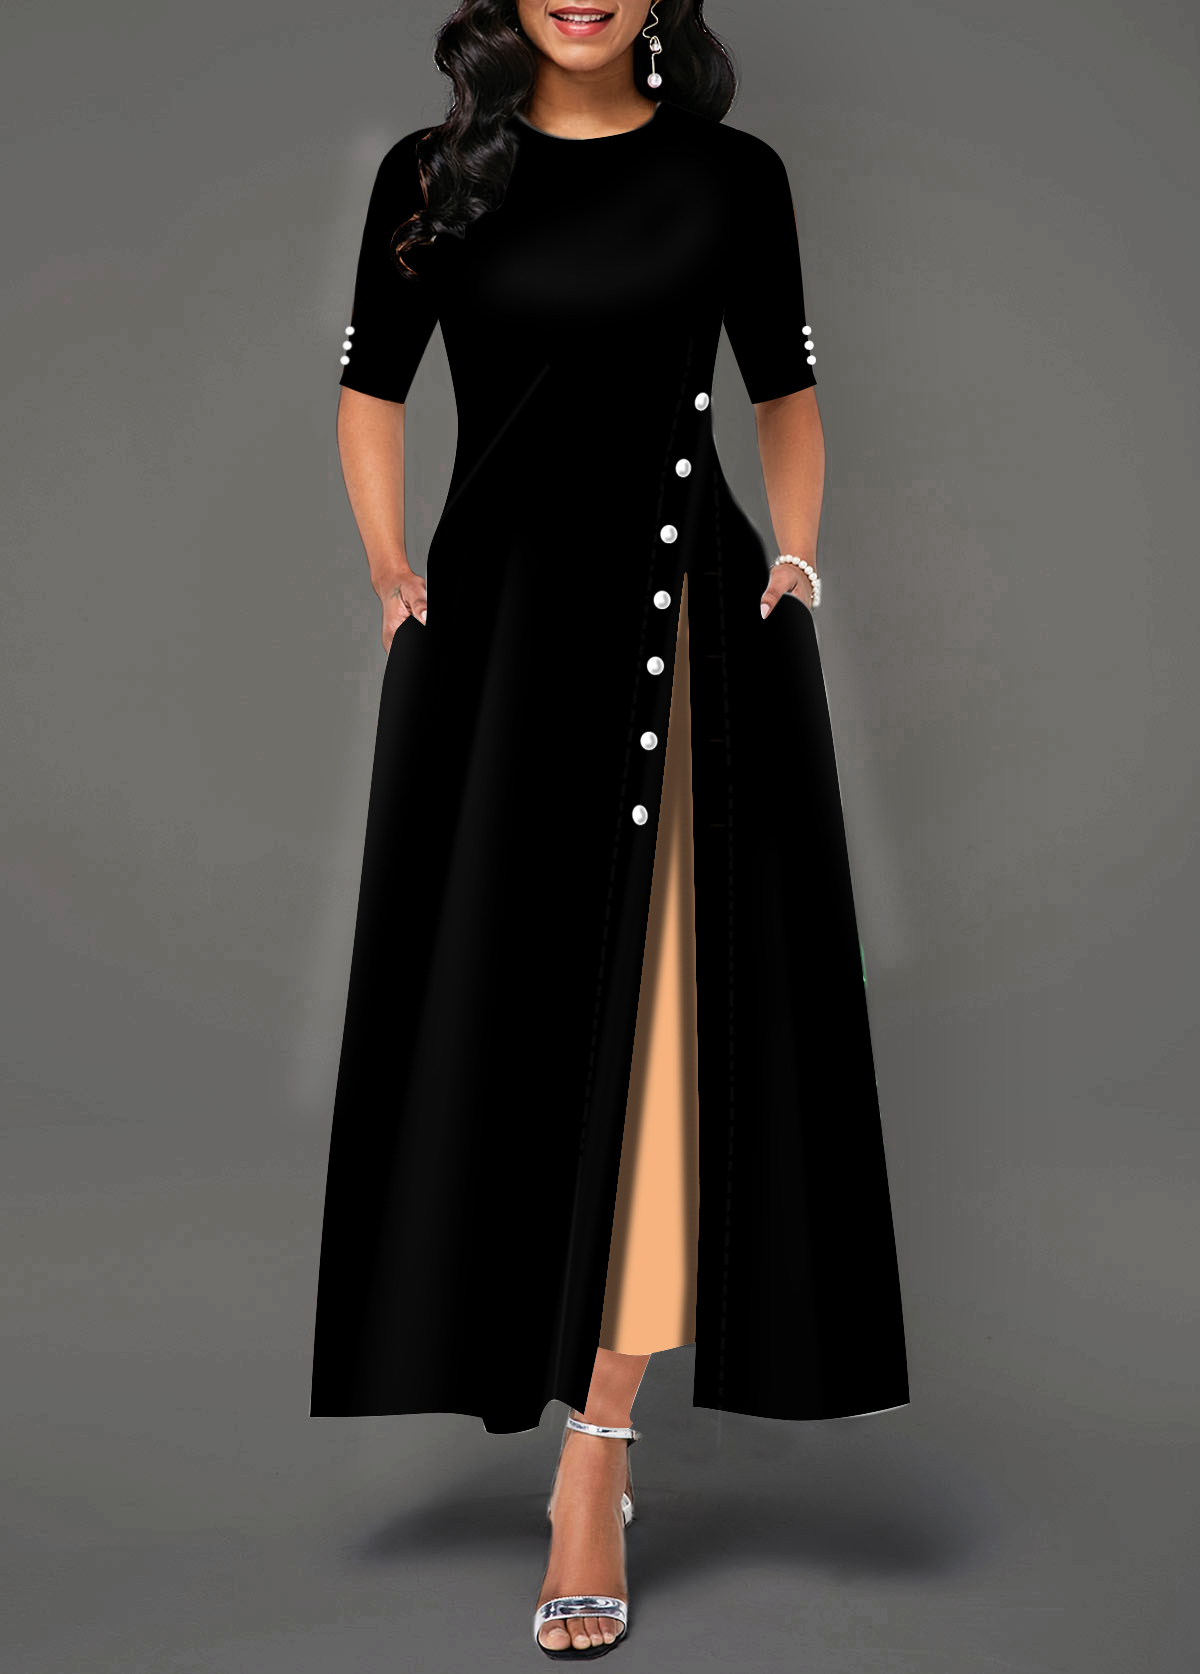 Half Sleeve Side Slit Button Detail Maxi Dress